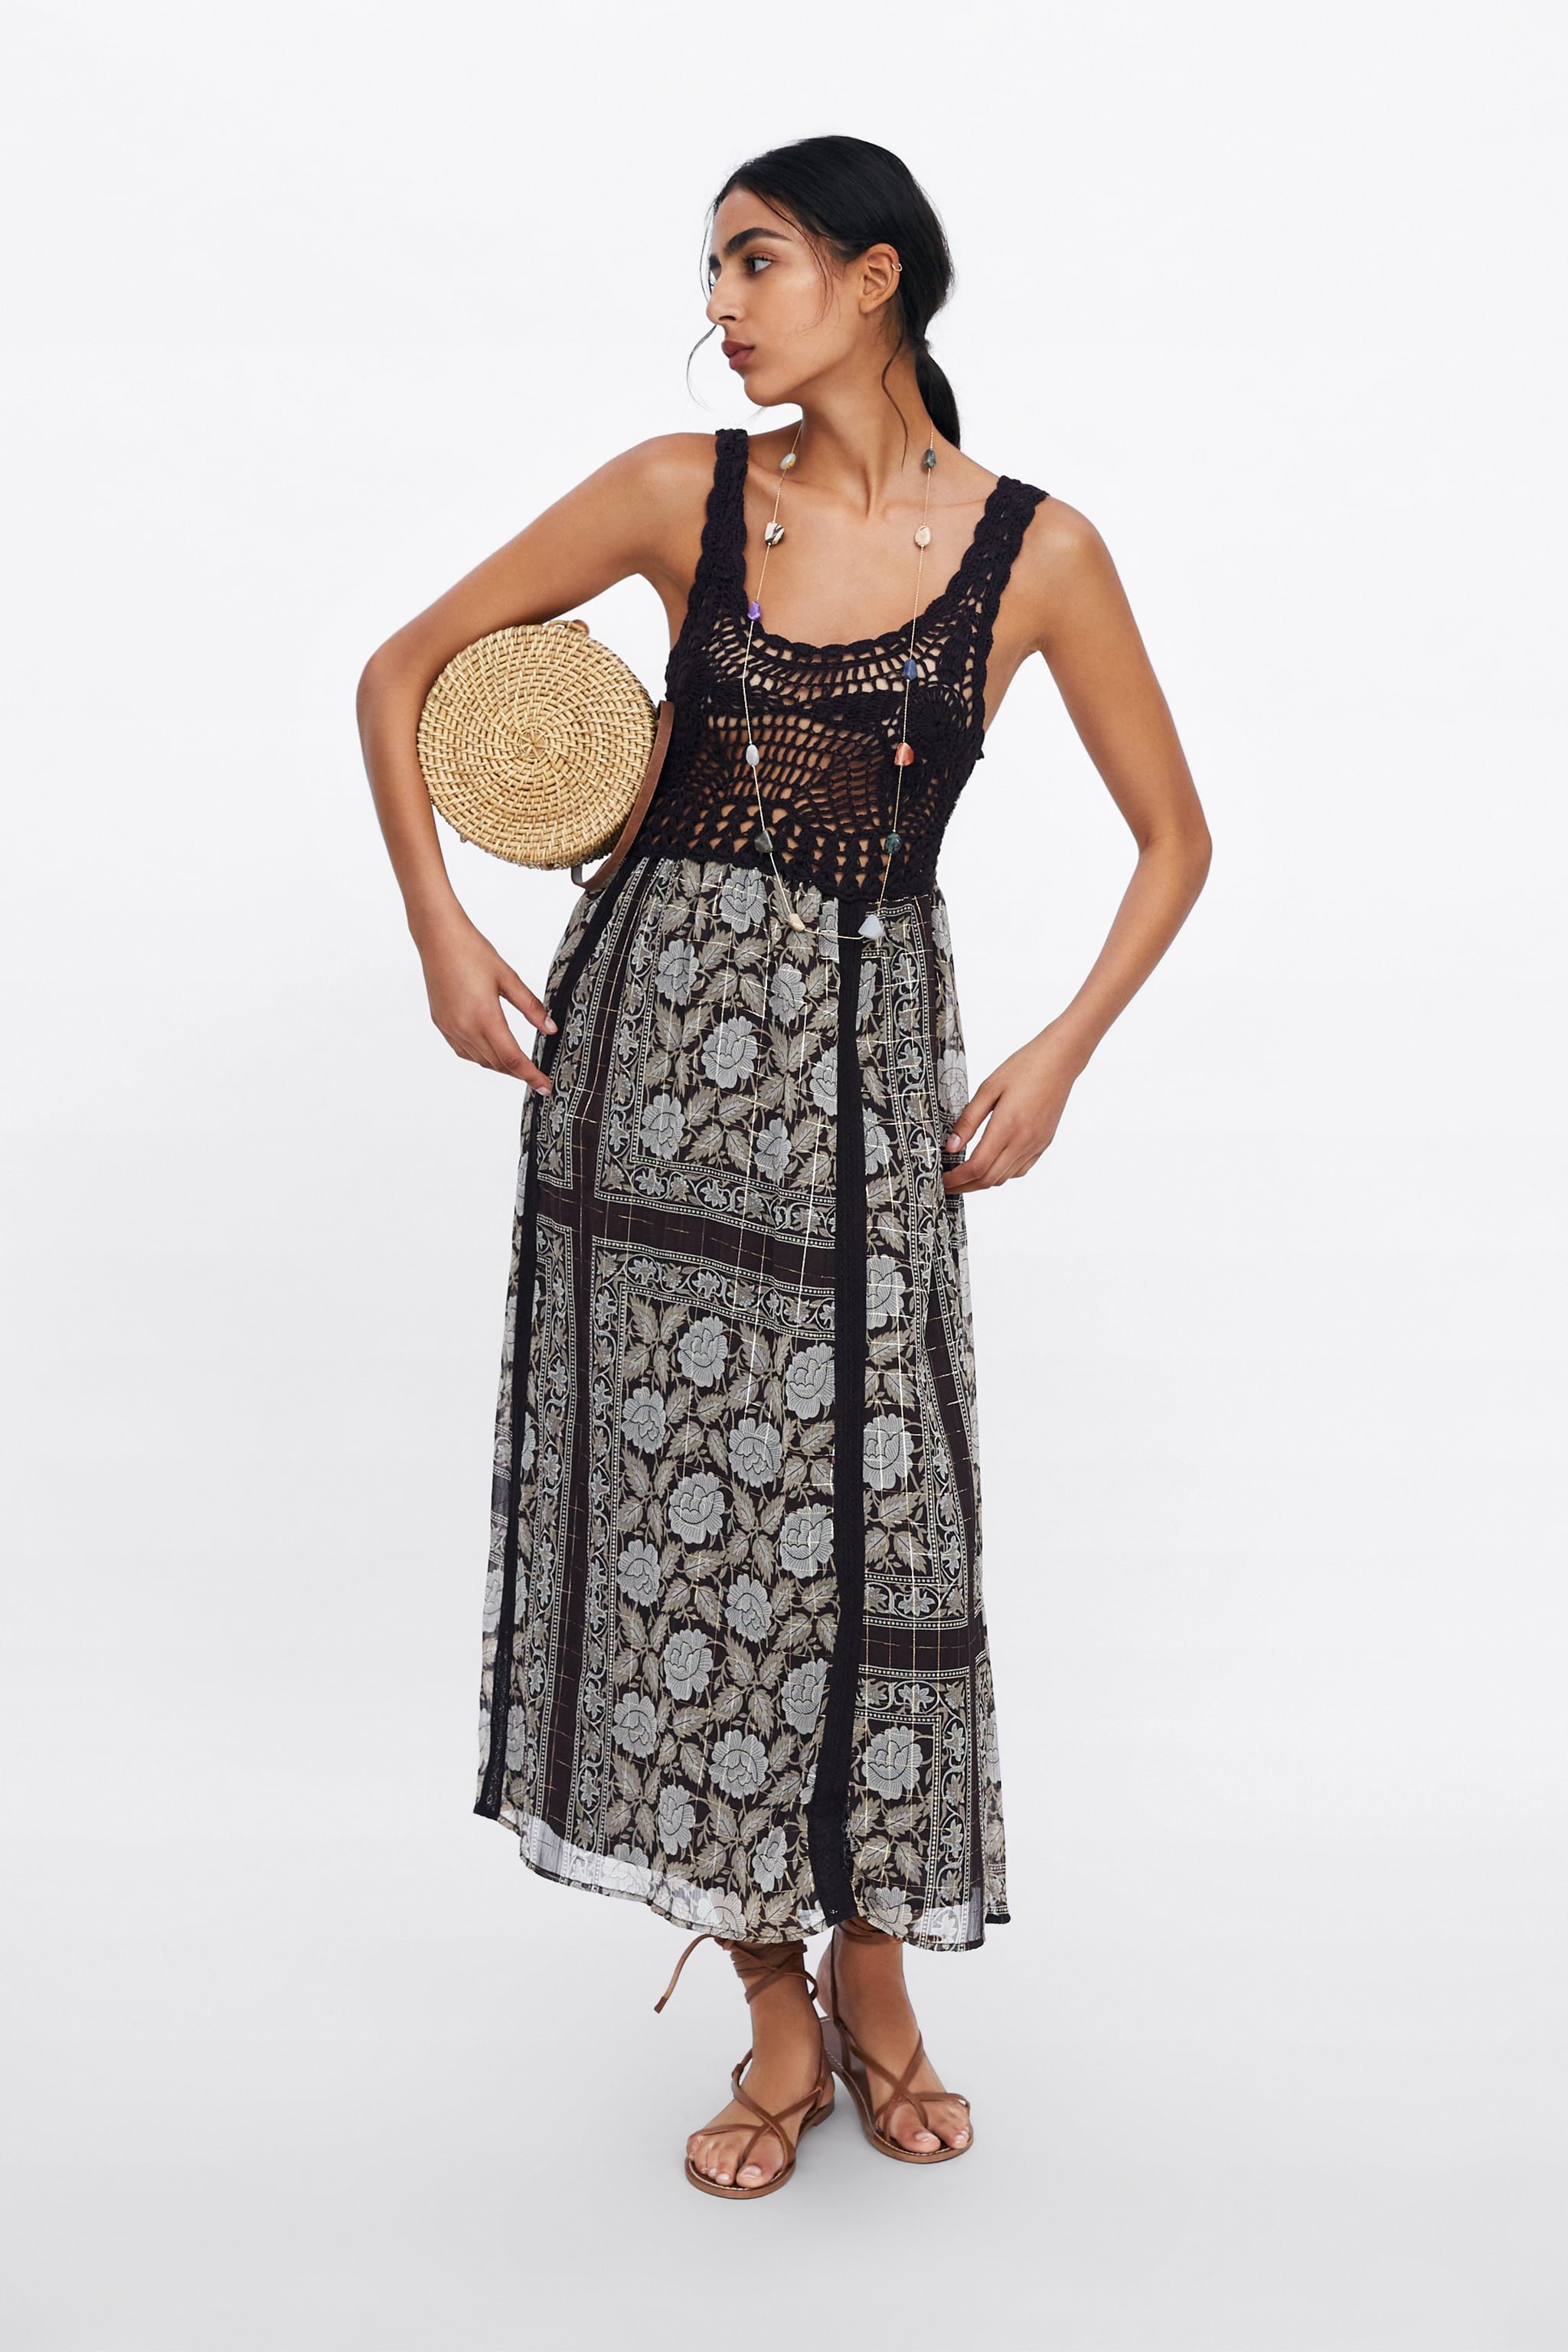 84e4d8078e Zara METALLIC THREAD PRINTED DRESS